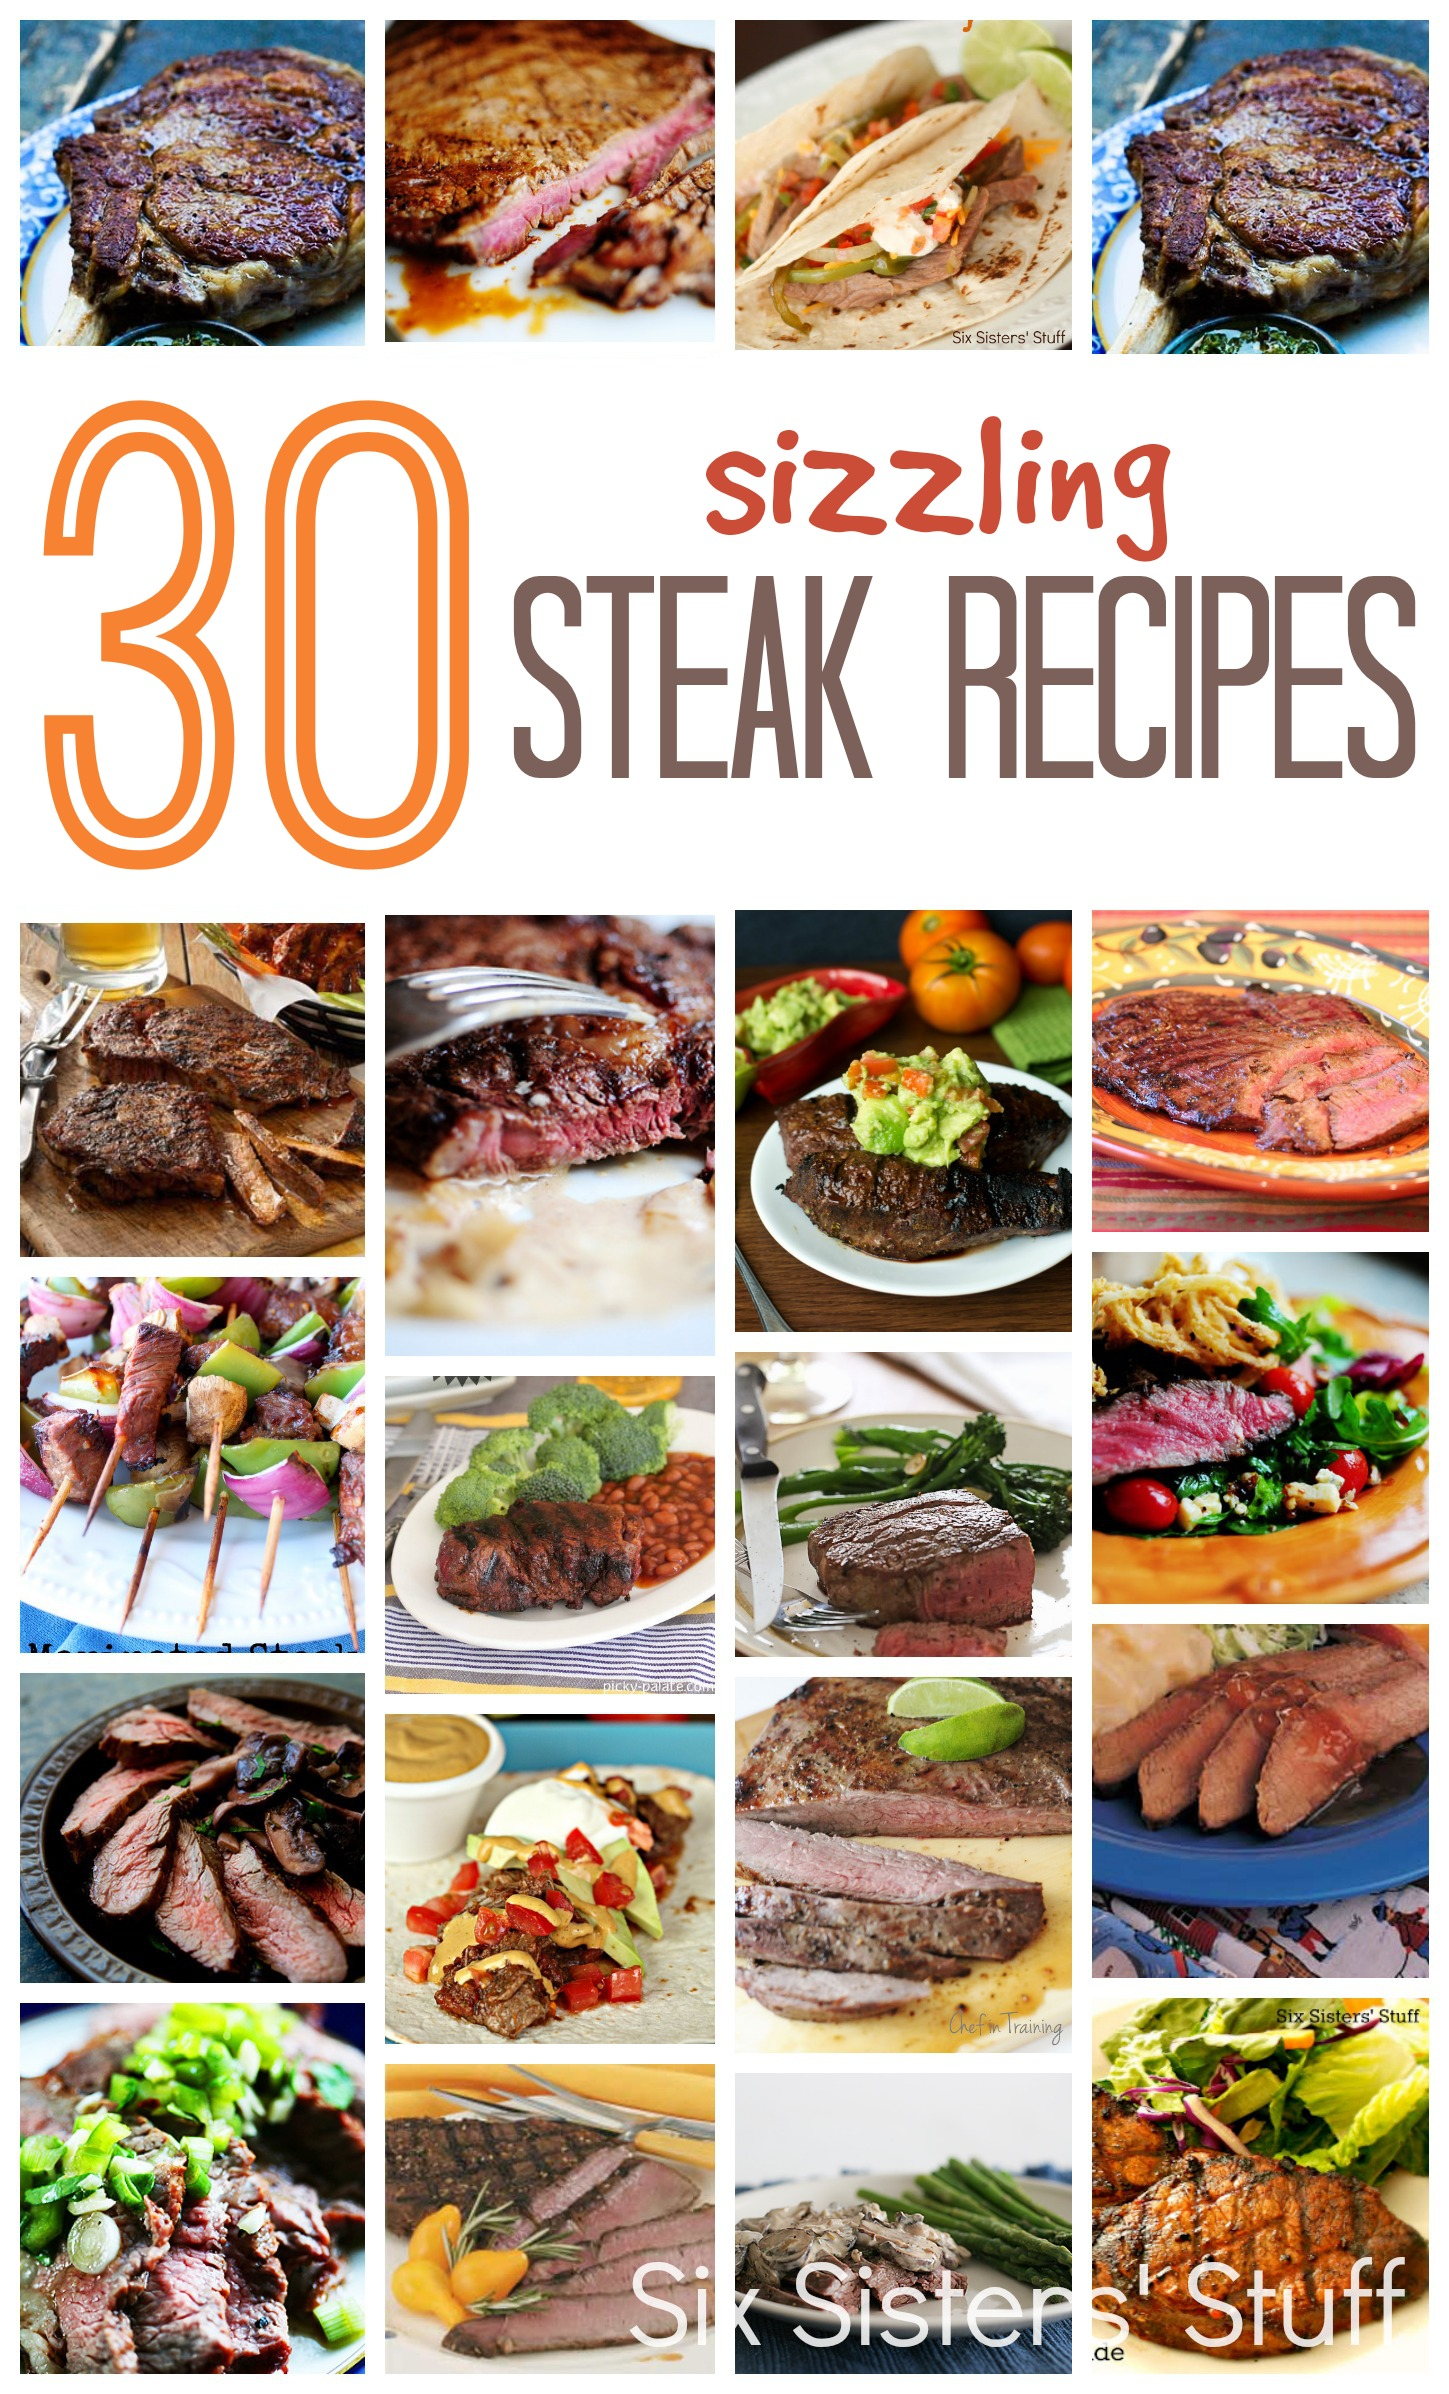 30 Sizzling Steak Recipes